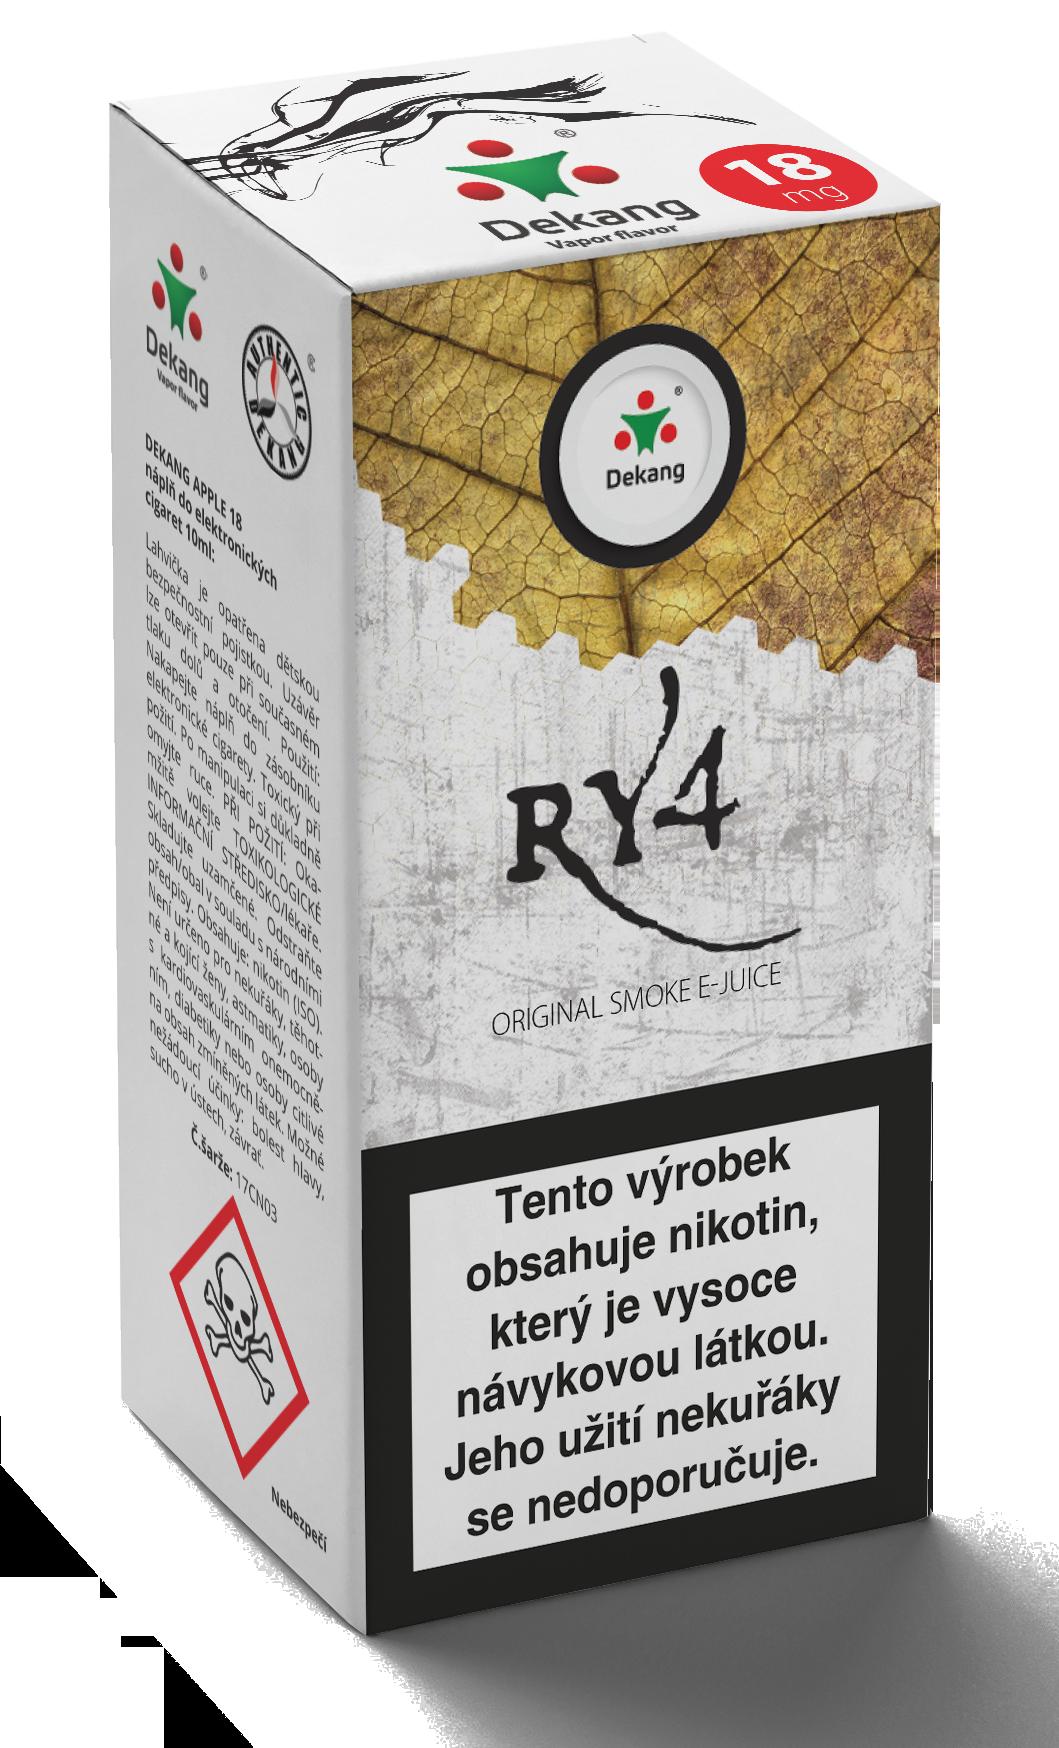 E-liquid Dekang 10ml RY4 (směs karamelu, vanilky a tabáku) Množství nikotinu: 0mg